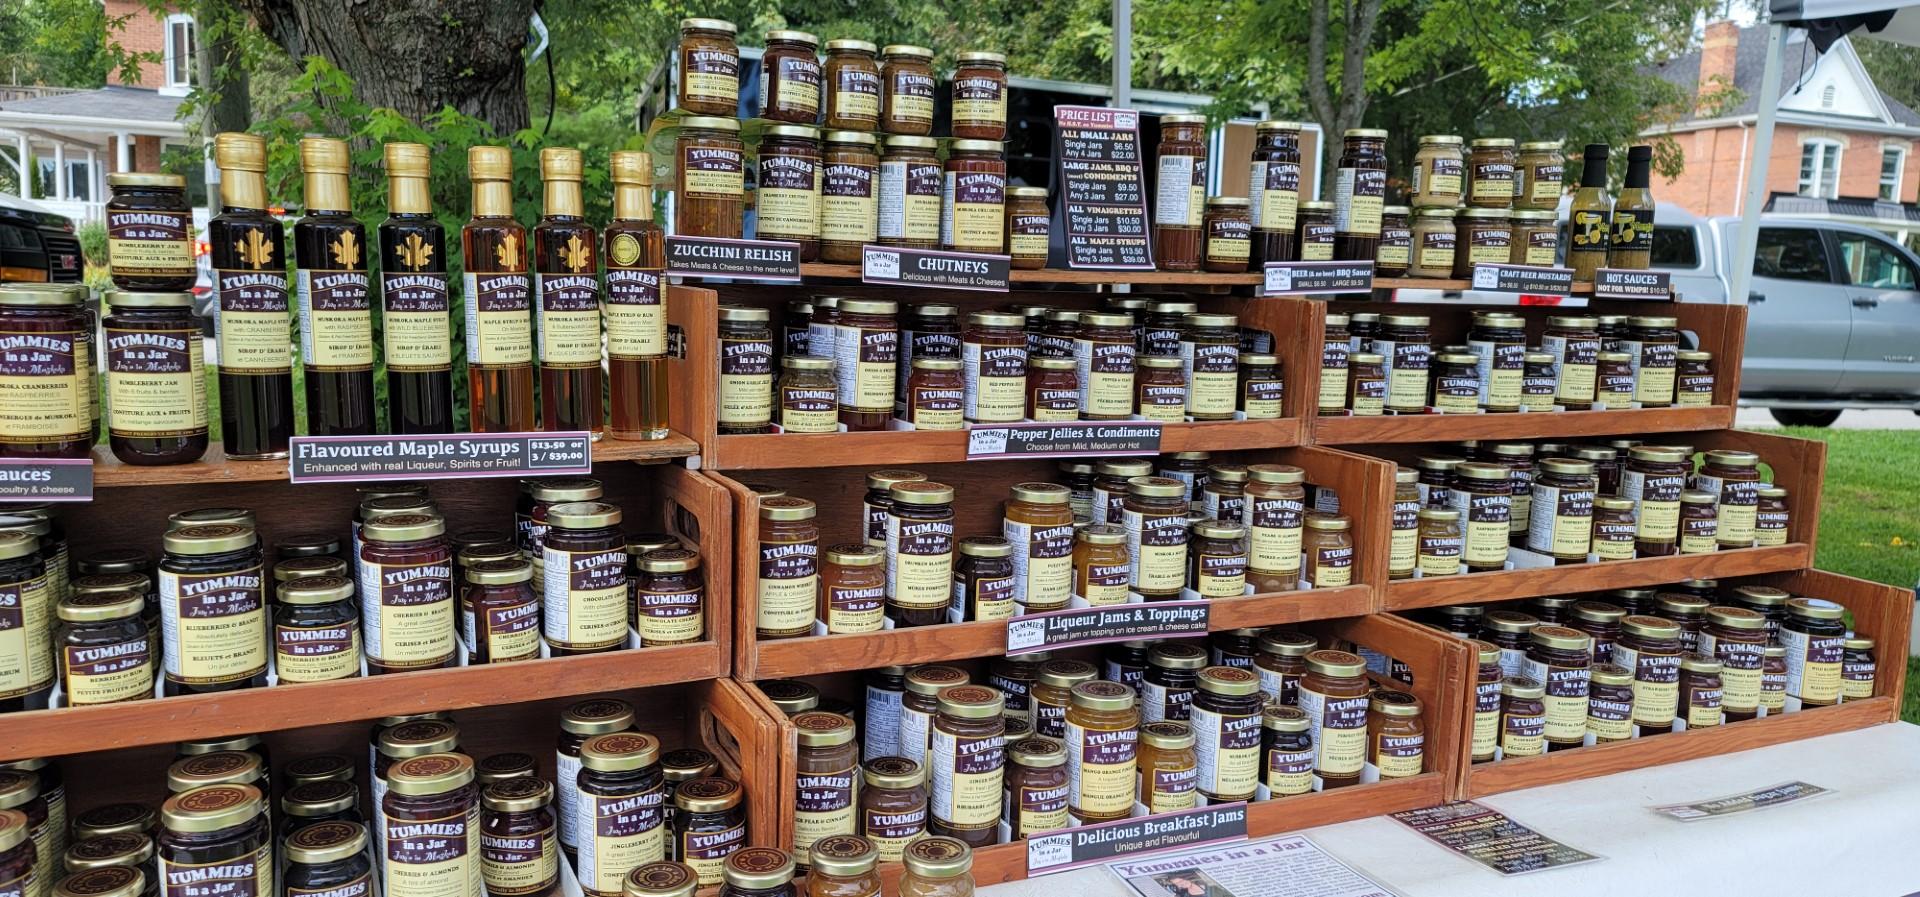 wall of jams at Bracebridge Farmer's market